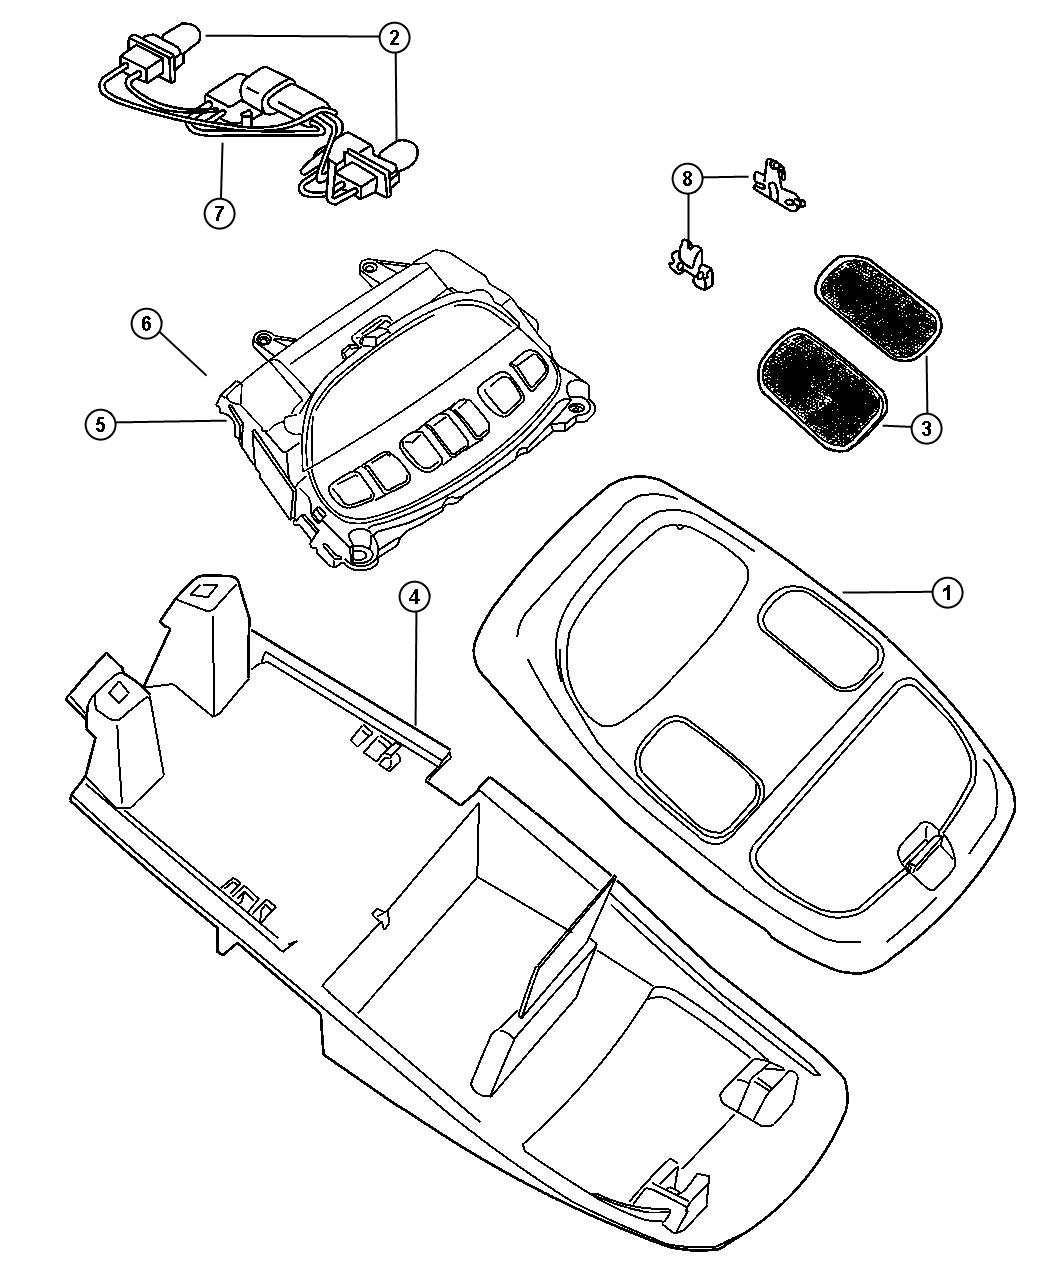 2006 Dodge Ram 1500 Wiring. Overhead console. Trim: [all